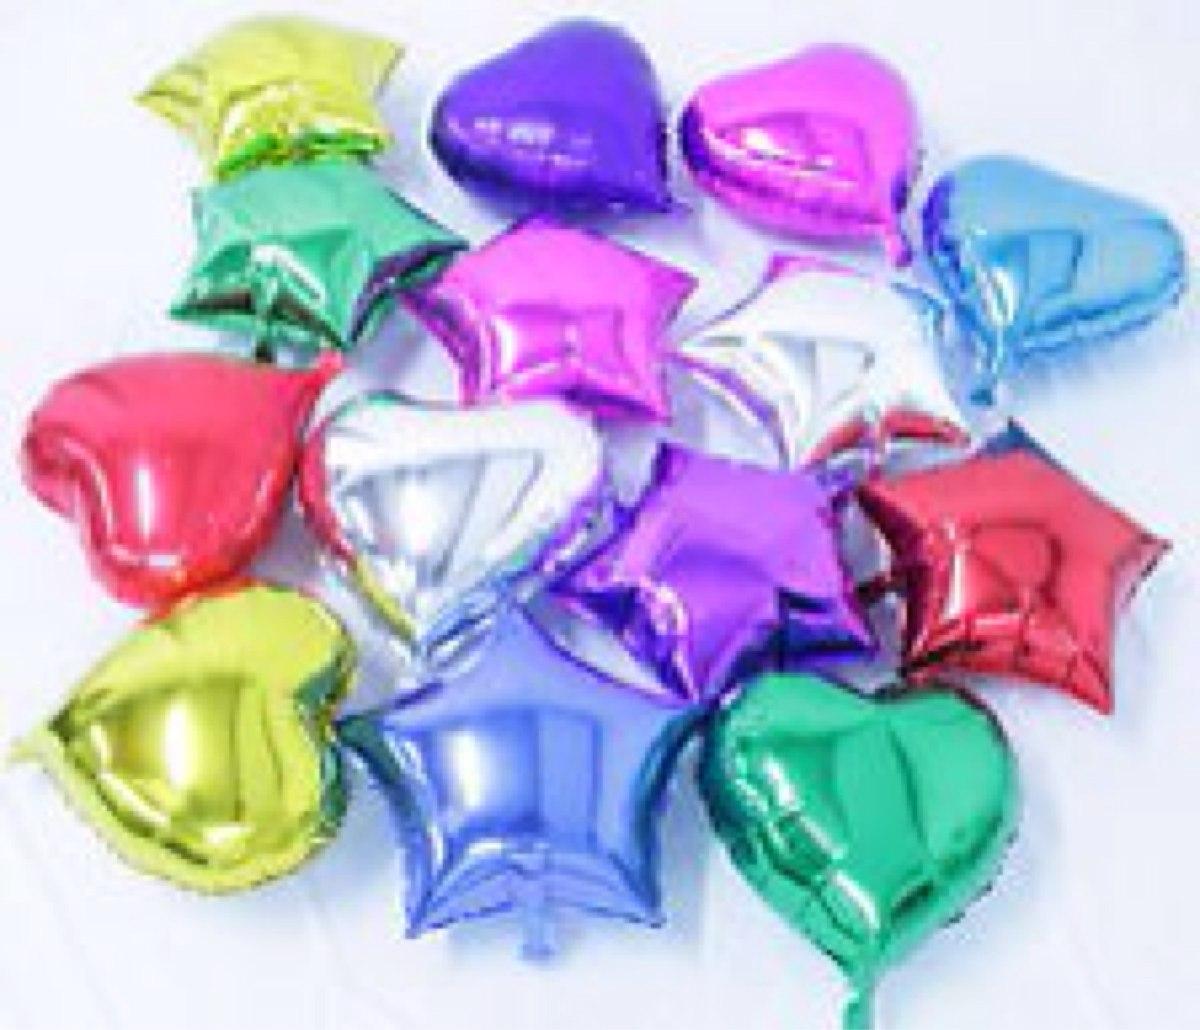 Paquete de 10 globos metalicos de estrella 50 cms mayoreo for Donde comprar globos